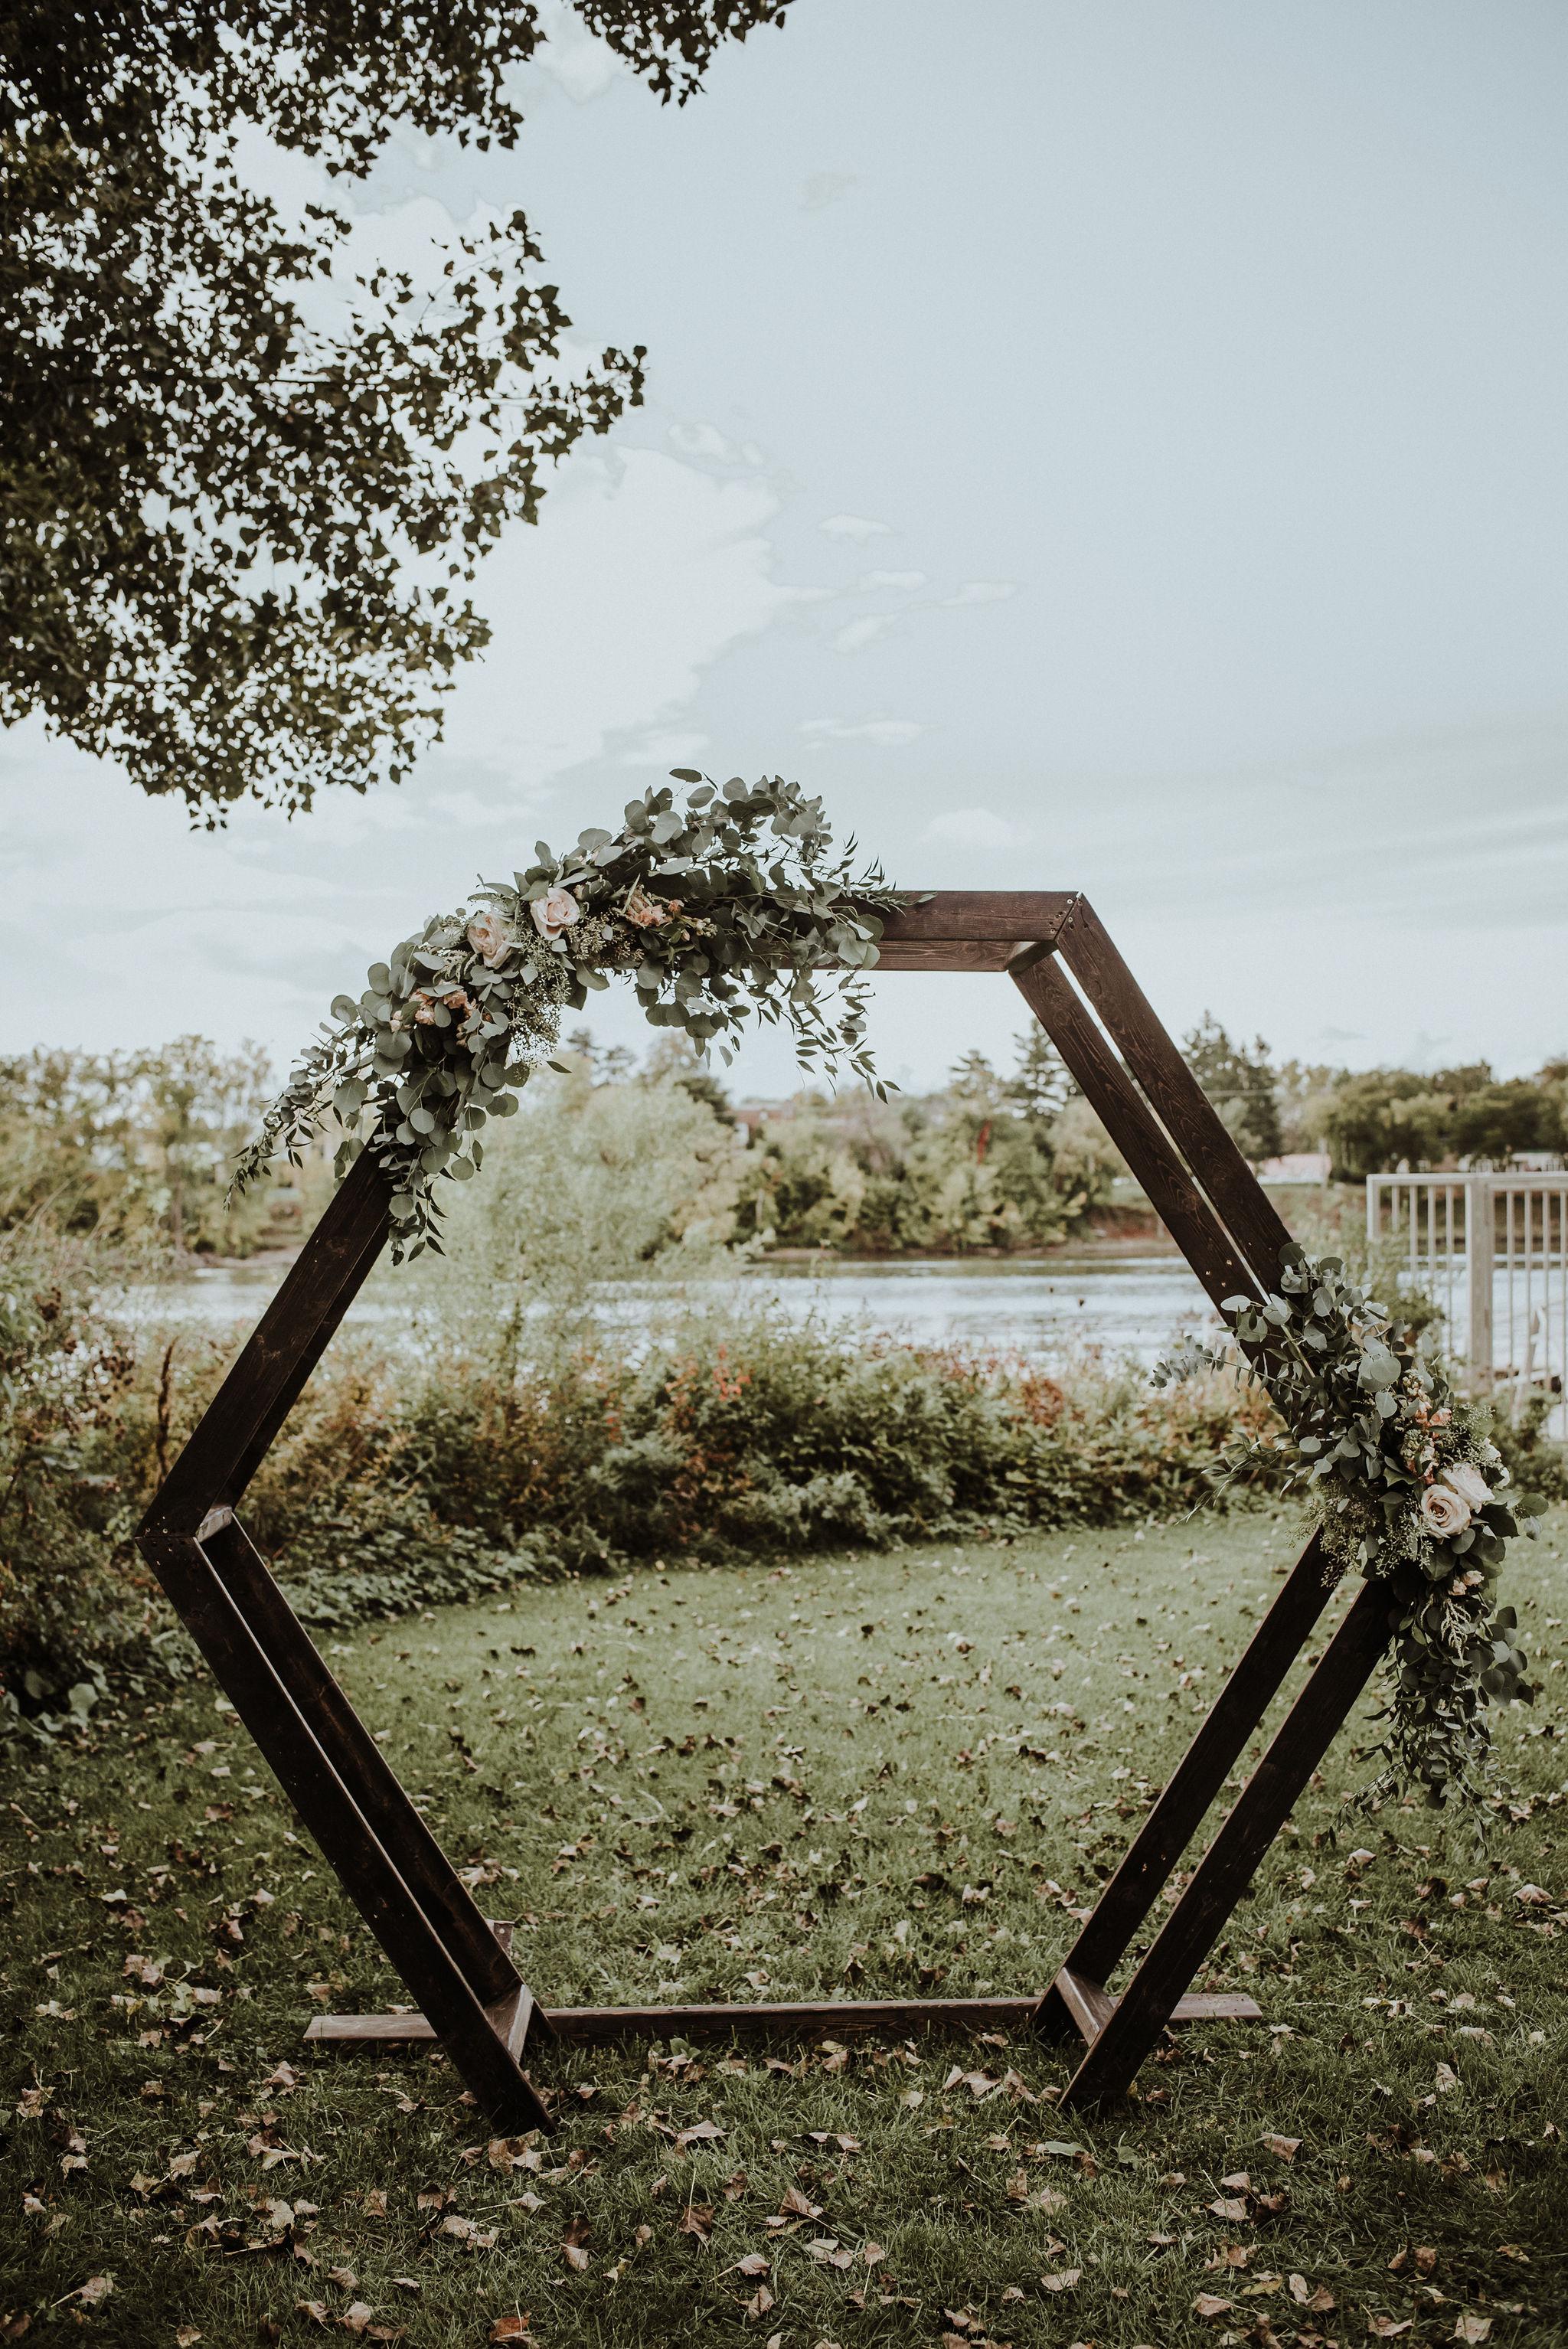 2000    Arche en bois Geo / Geo Wood Arch    1